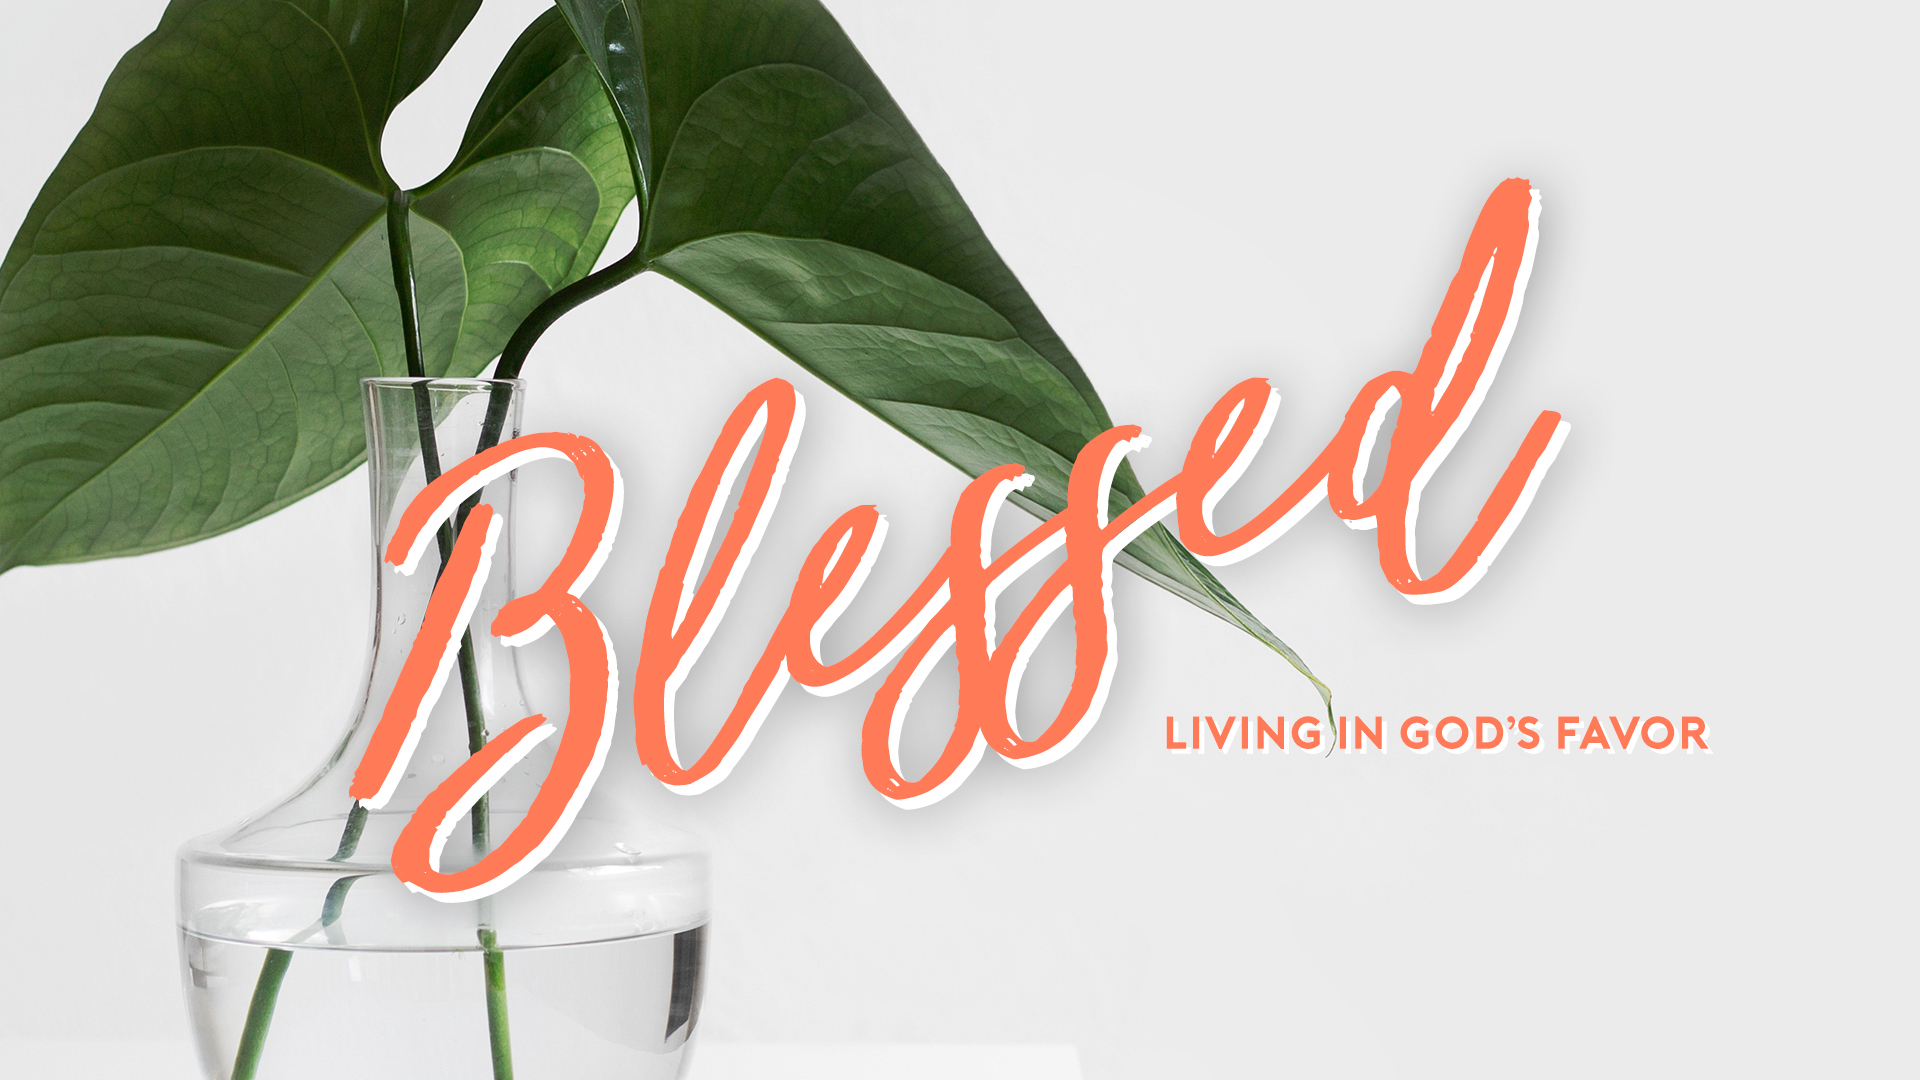 Blessed_Onscreen_1920x1080.jpg